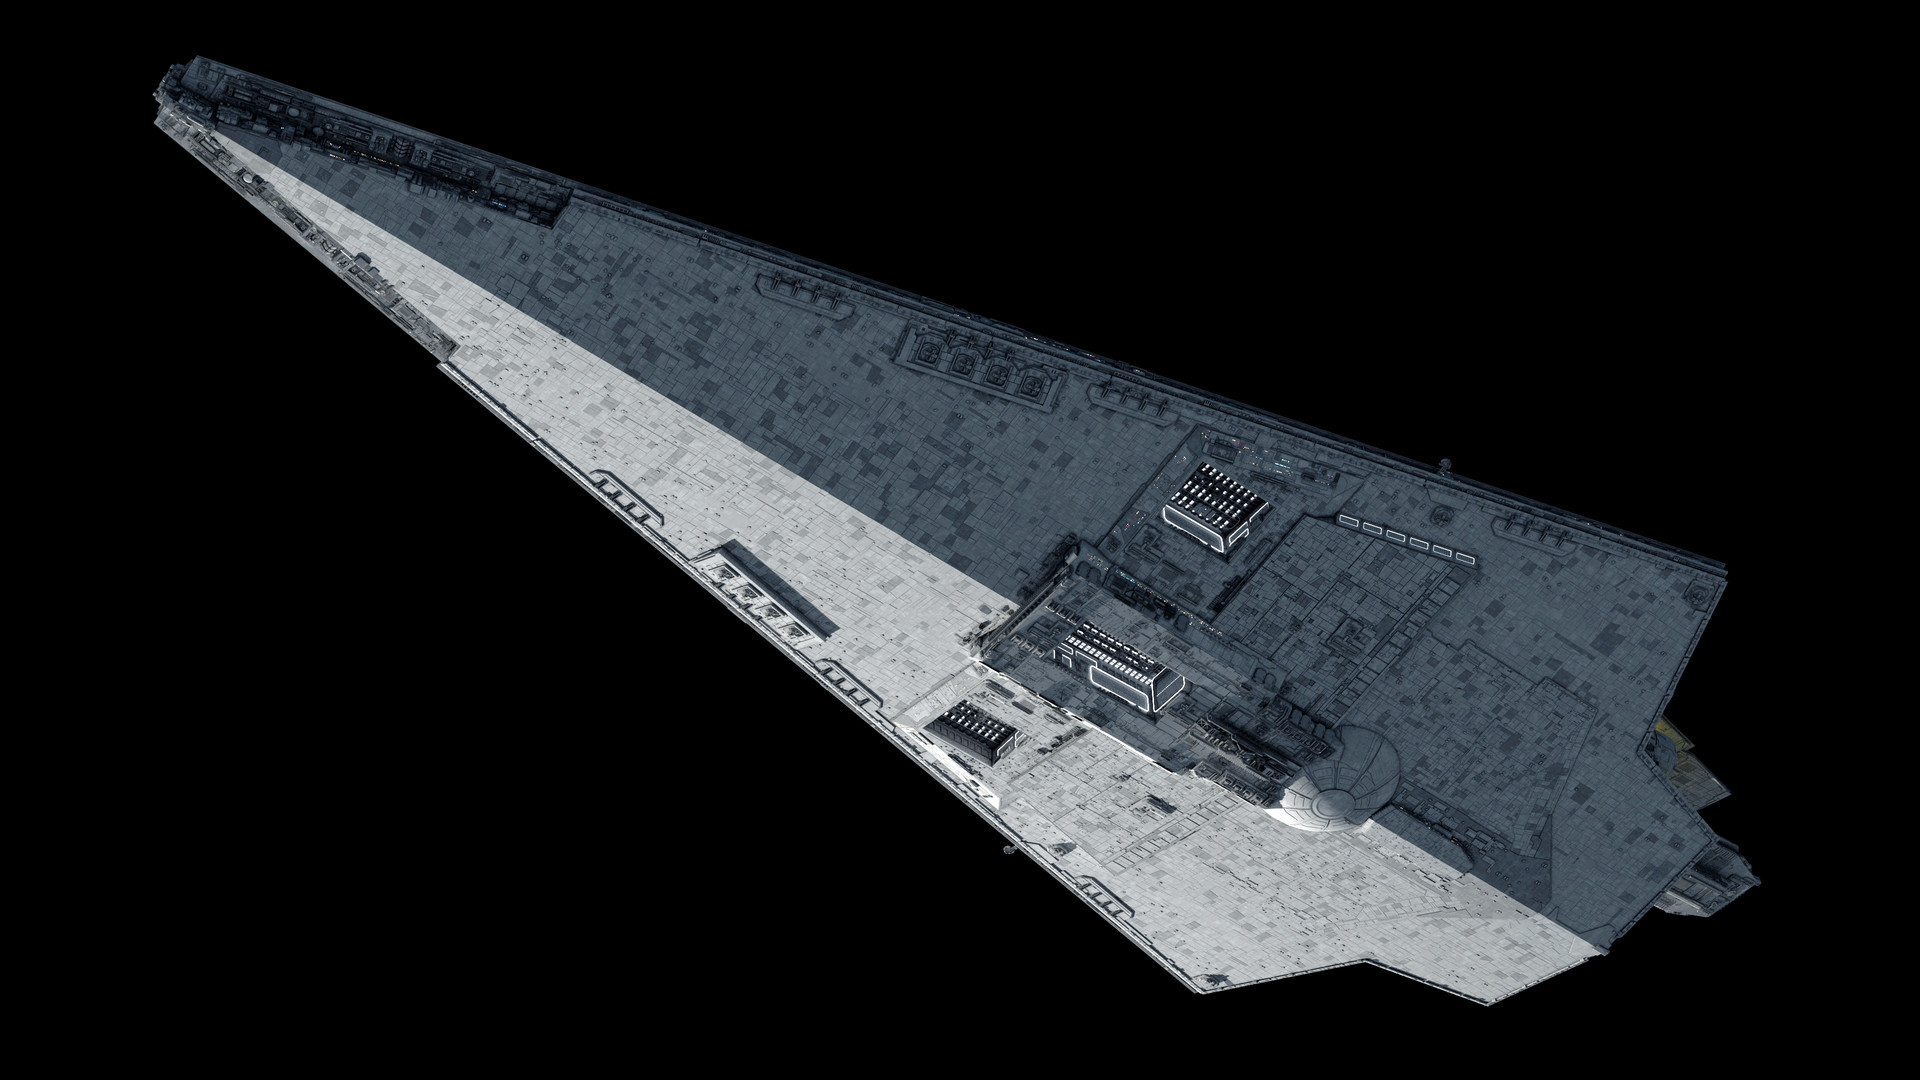 Ansel hsiao cruiser34